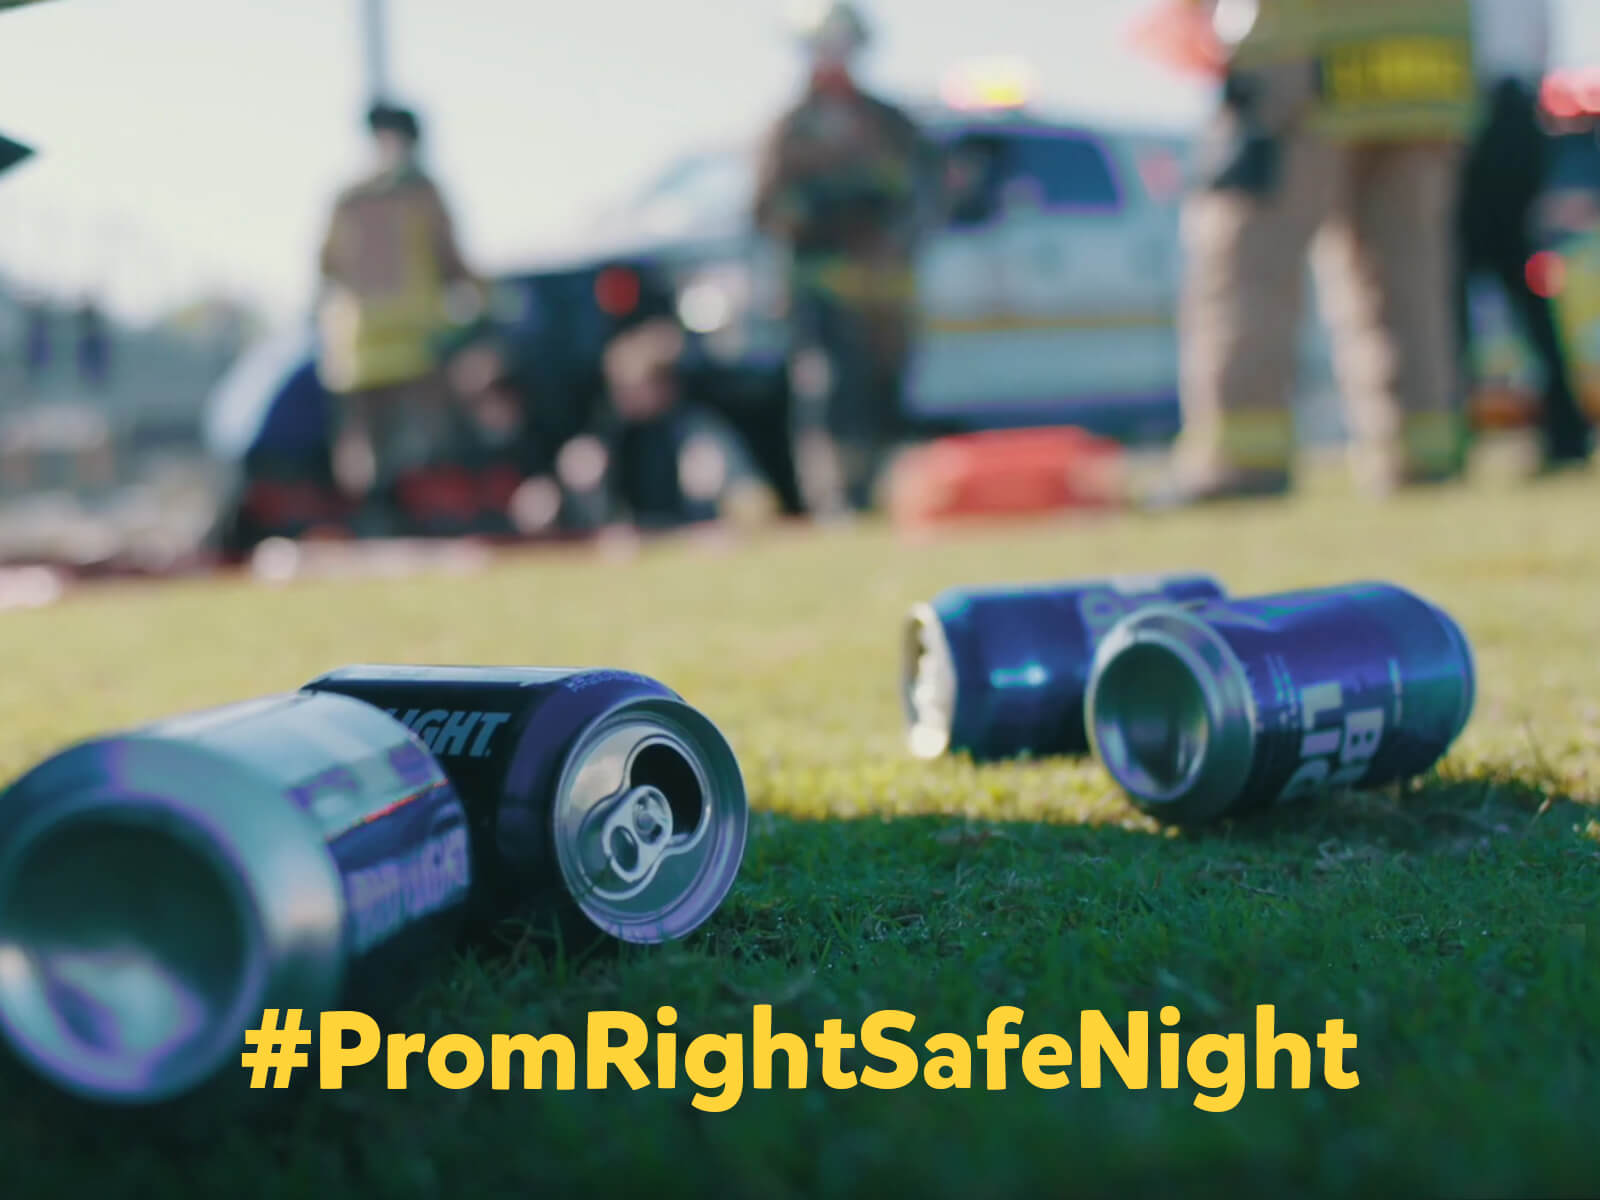 #PromRightSafeNight